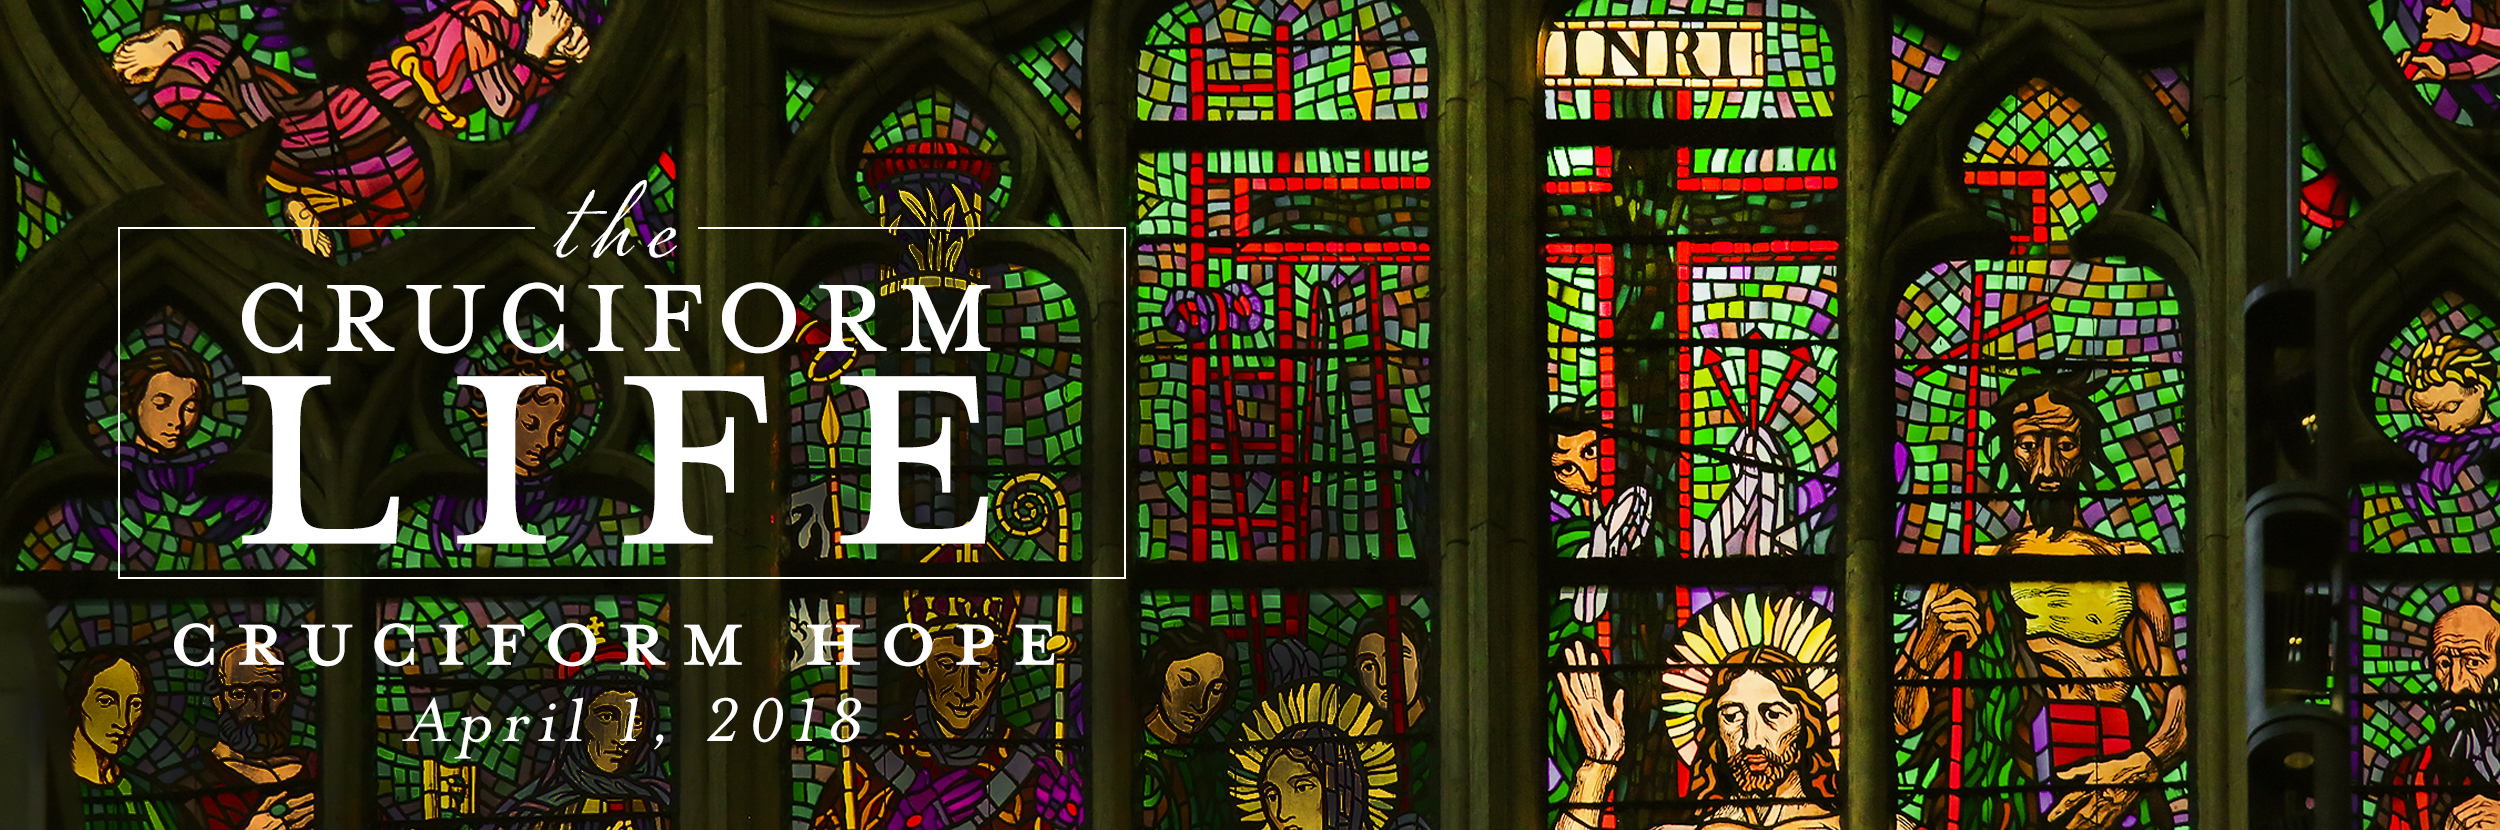 9. Cruciform Life_Hope Banner.jpg